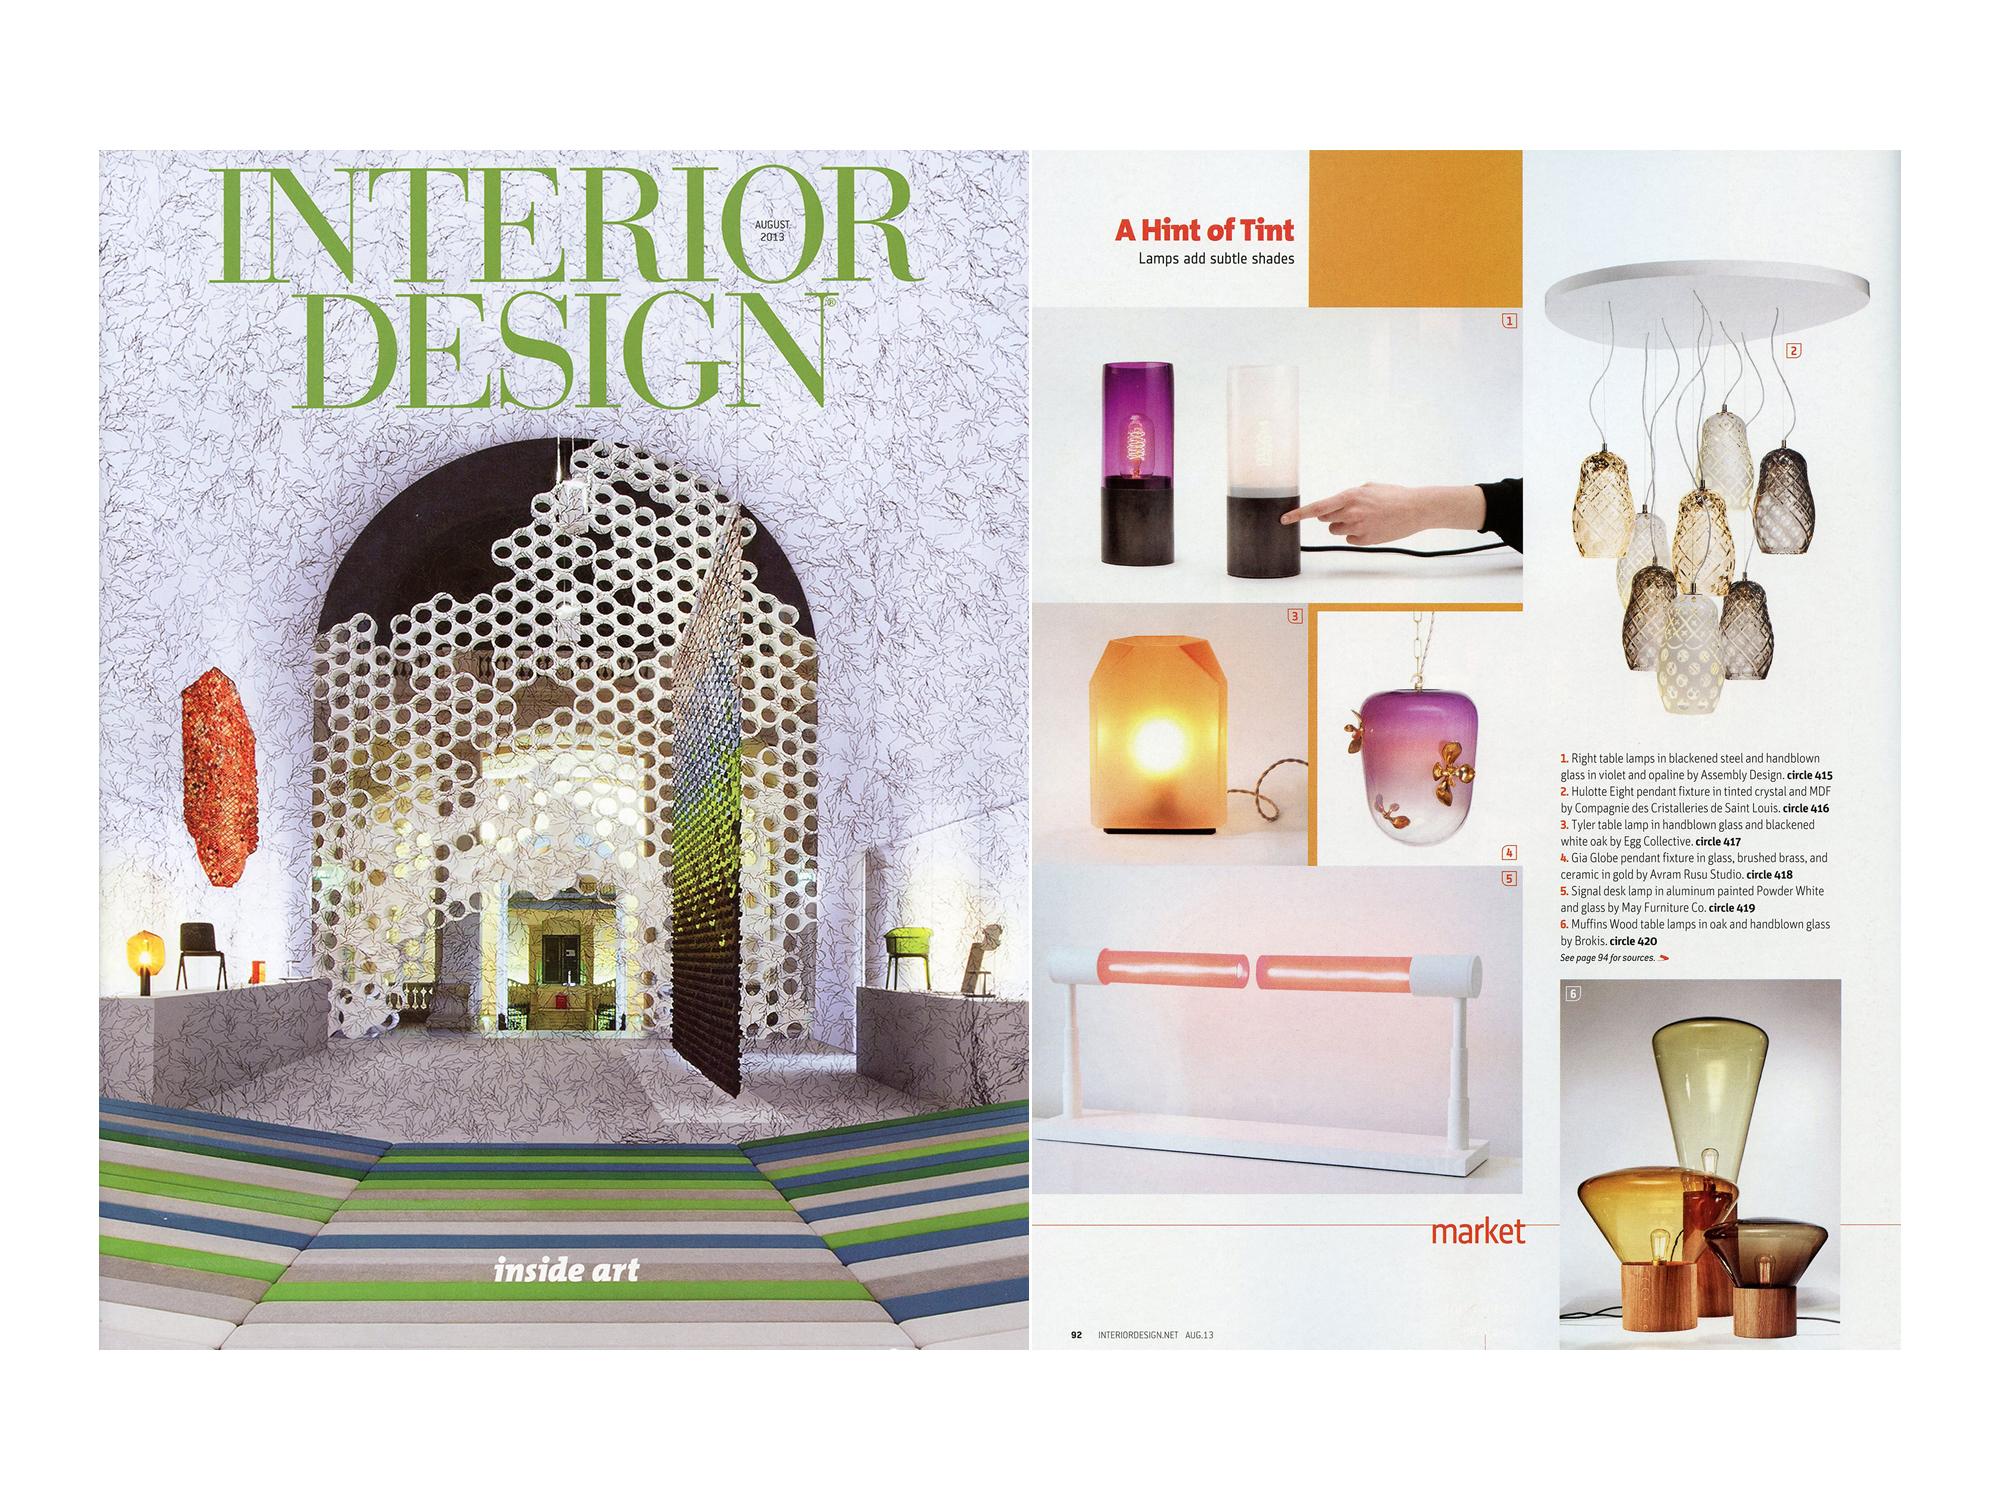 Avram_Rusu_Interior_Design_1_Press_Page.jpg